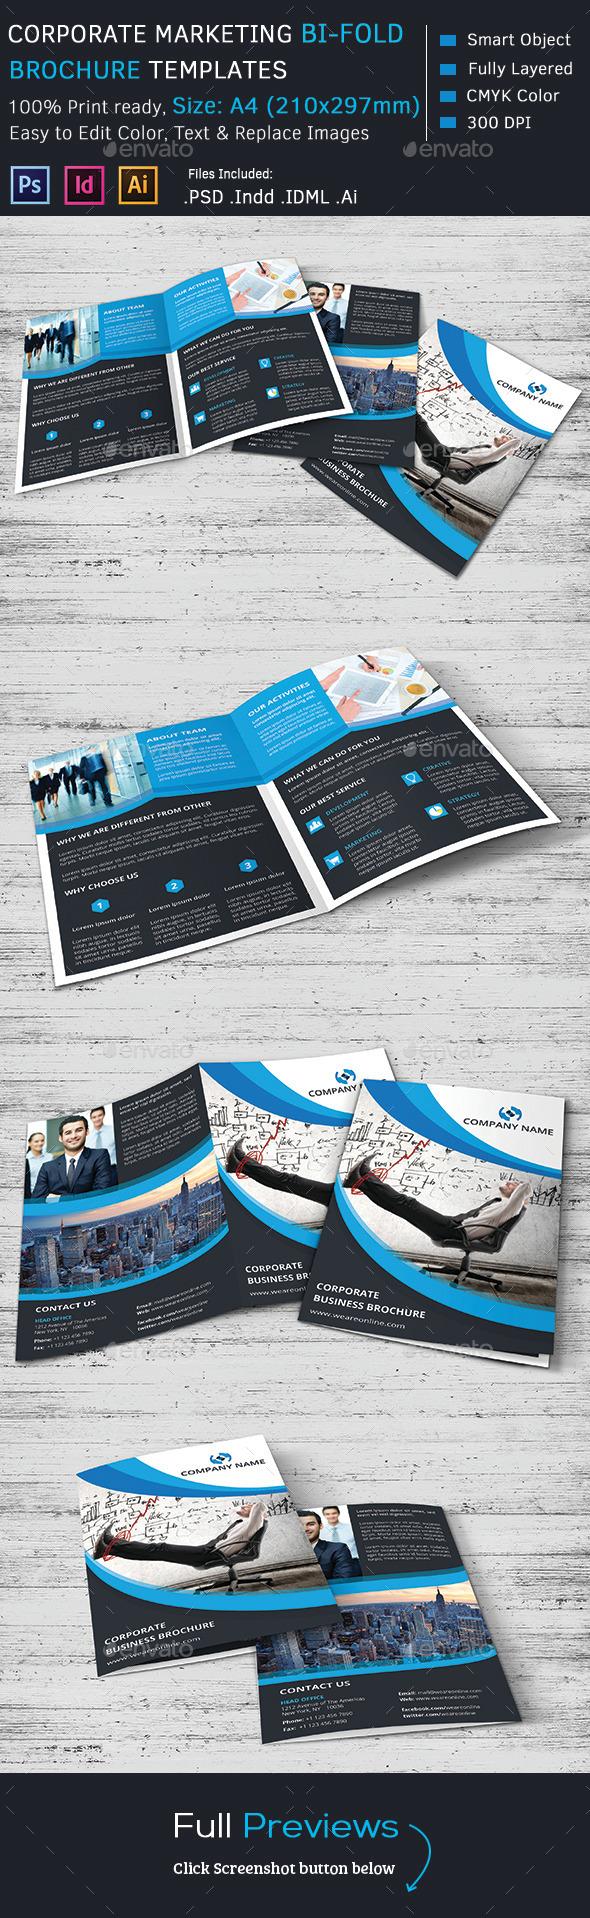 GraphicRiver Corporate Marketing Bi-Fold Brochure 9695854